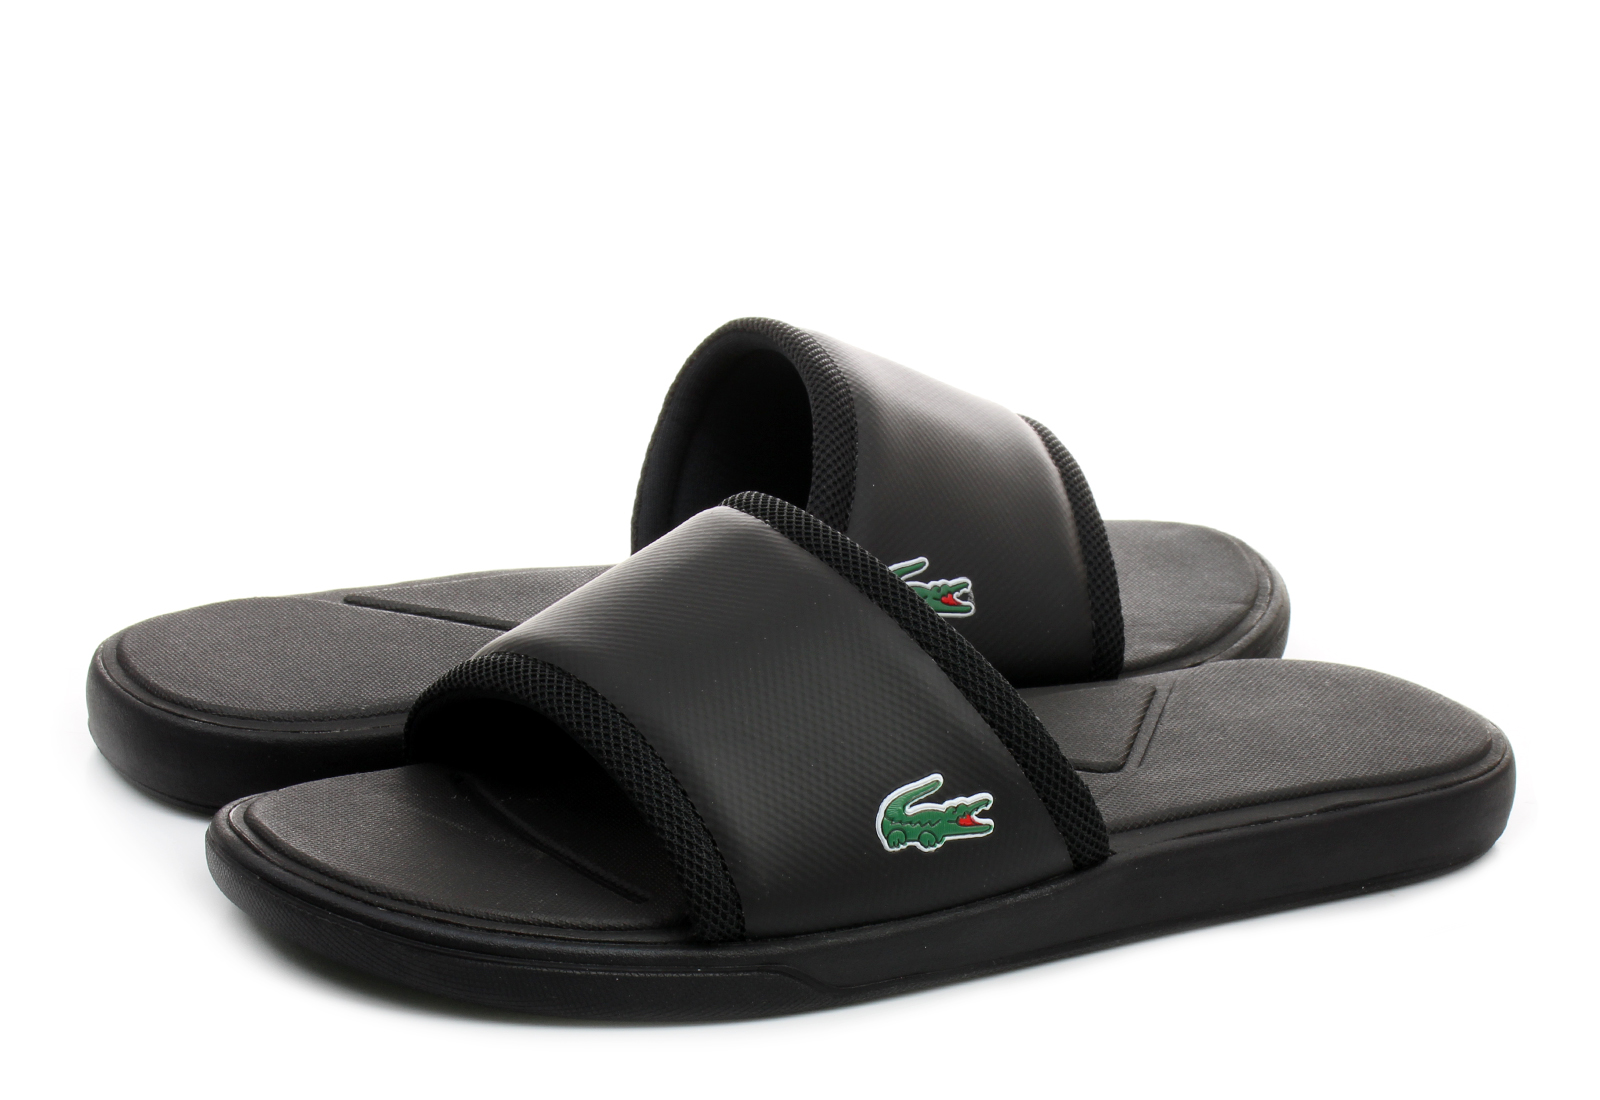 2dde89d5f753e2 Lacoste Slippers - L.30 Slide Sport - 181spm2169-024 - Online shop ...